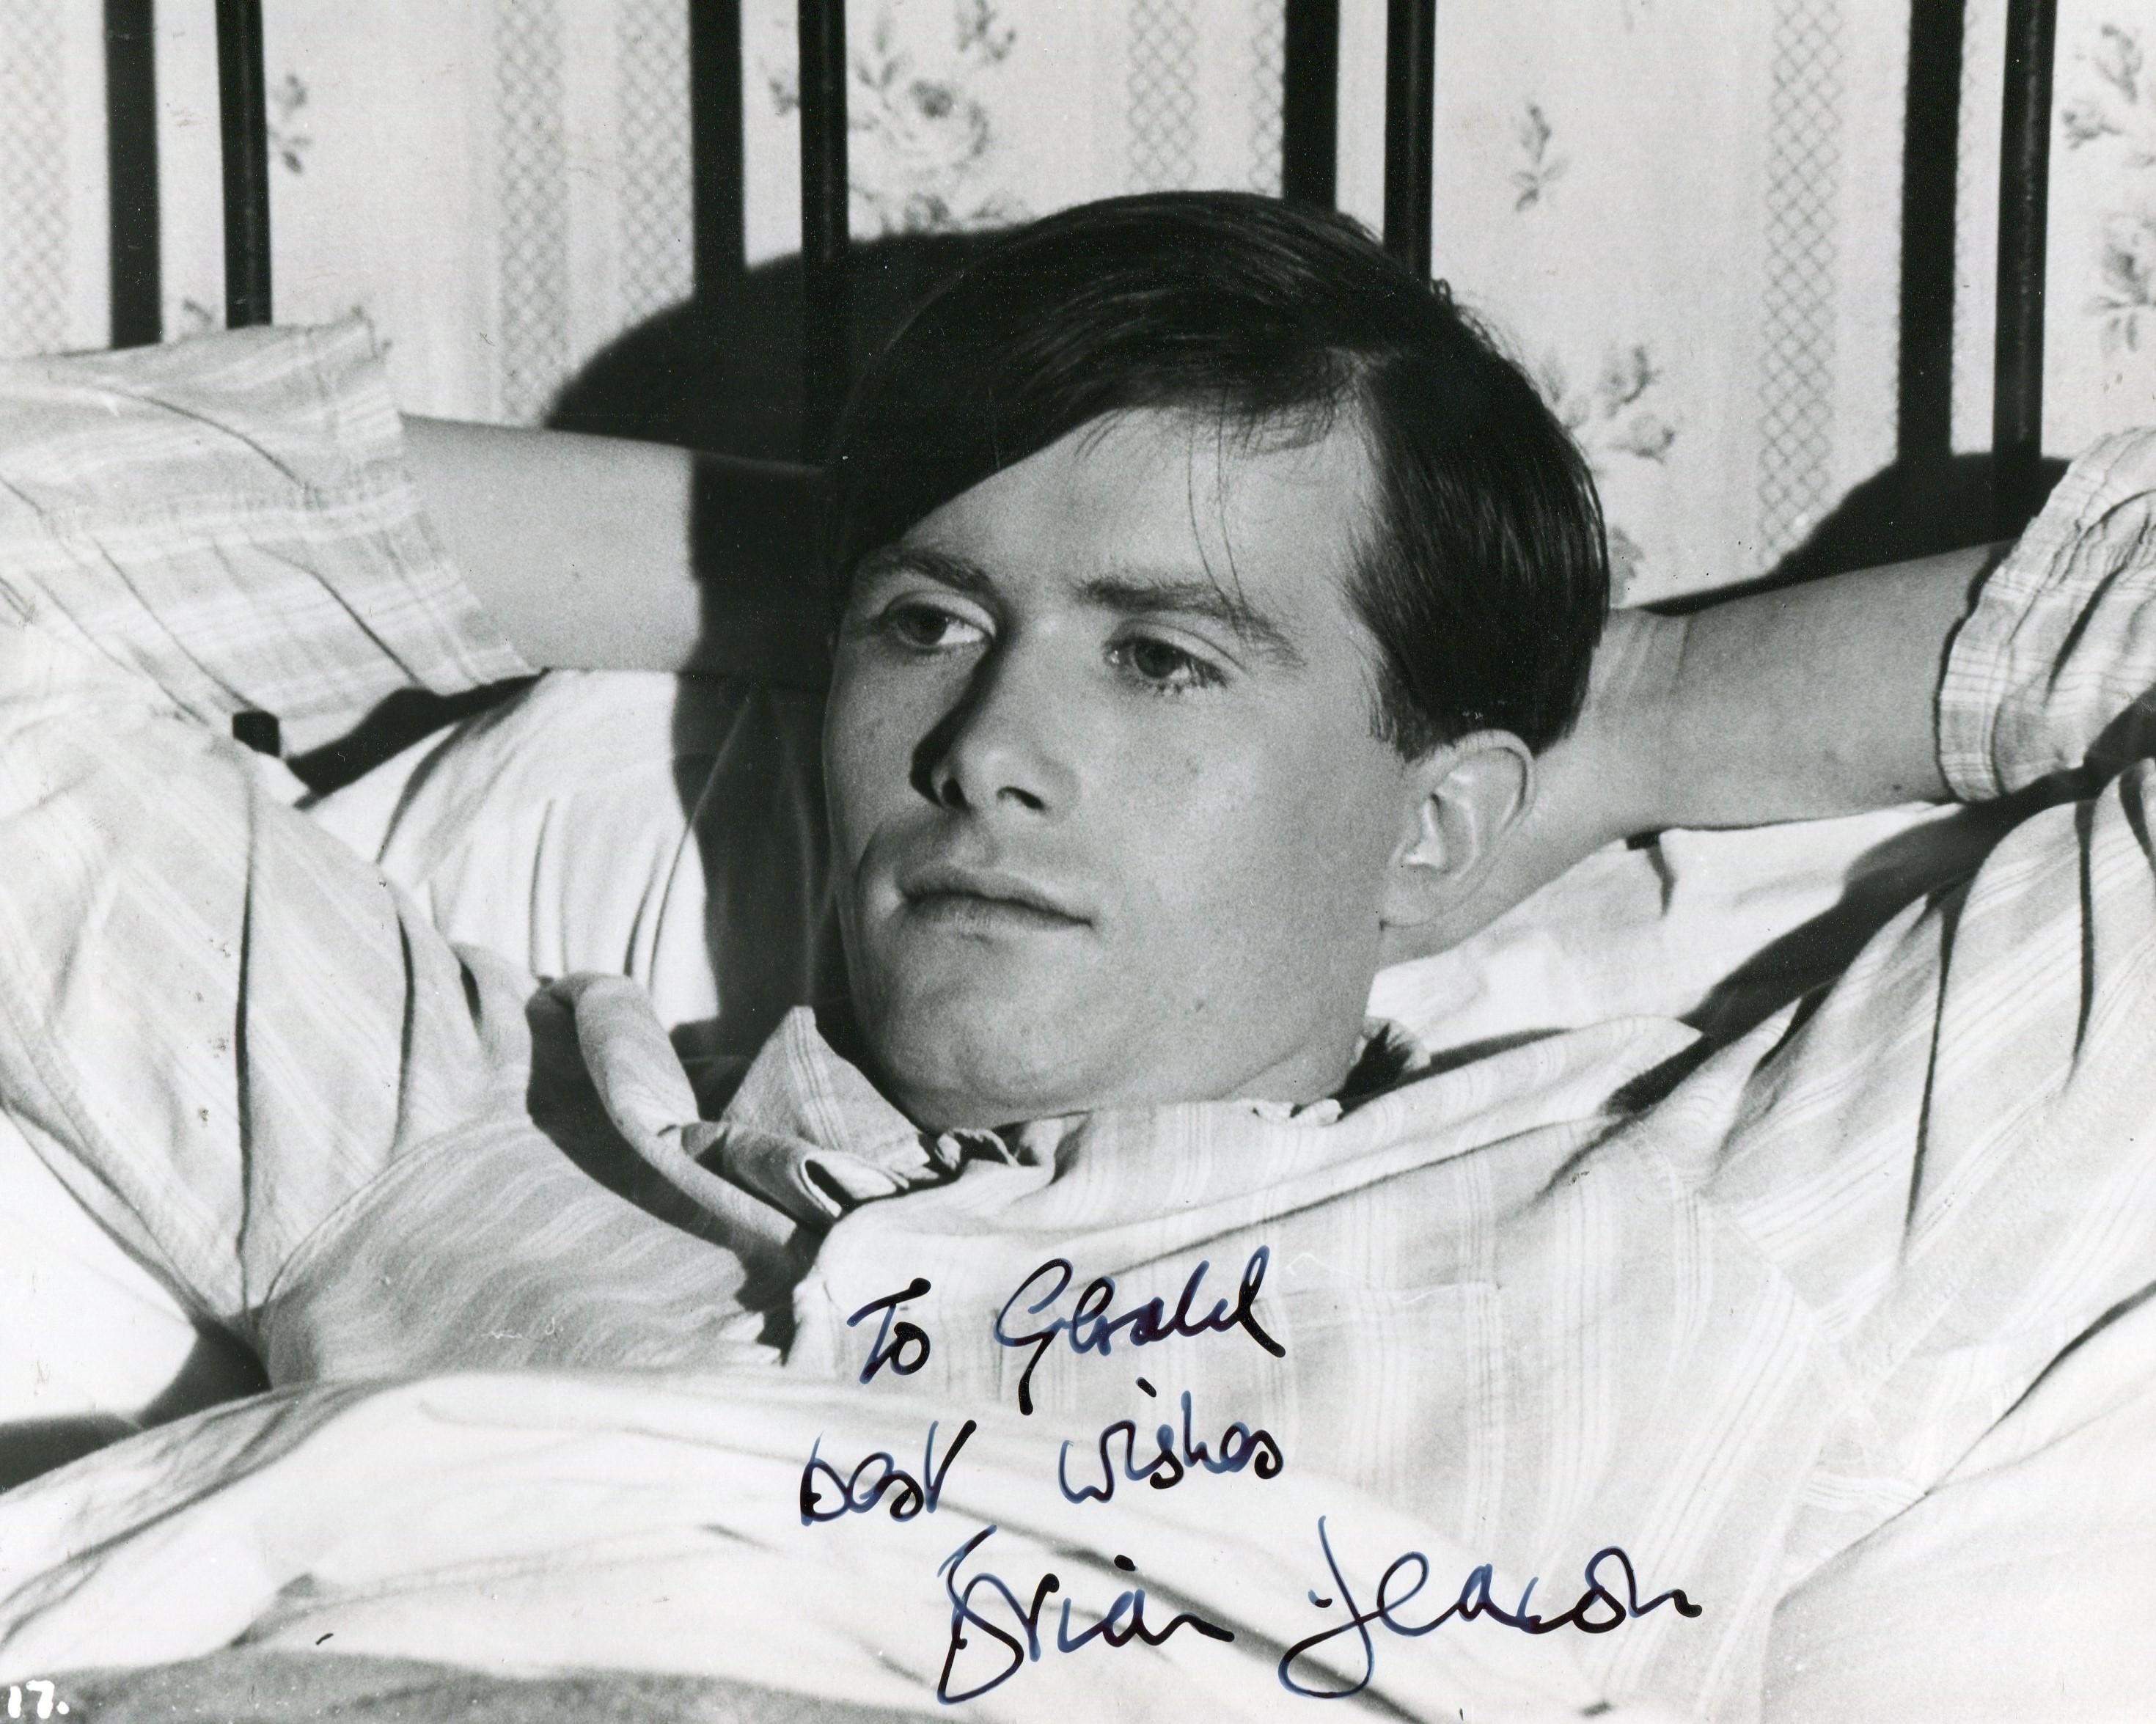 Brian Deacon Net Worth